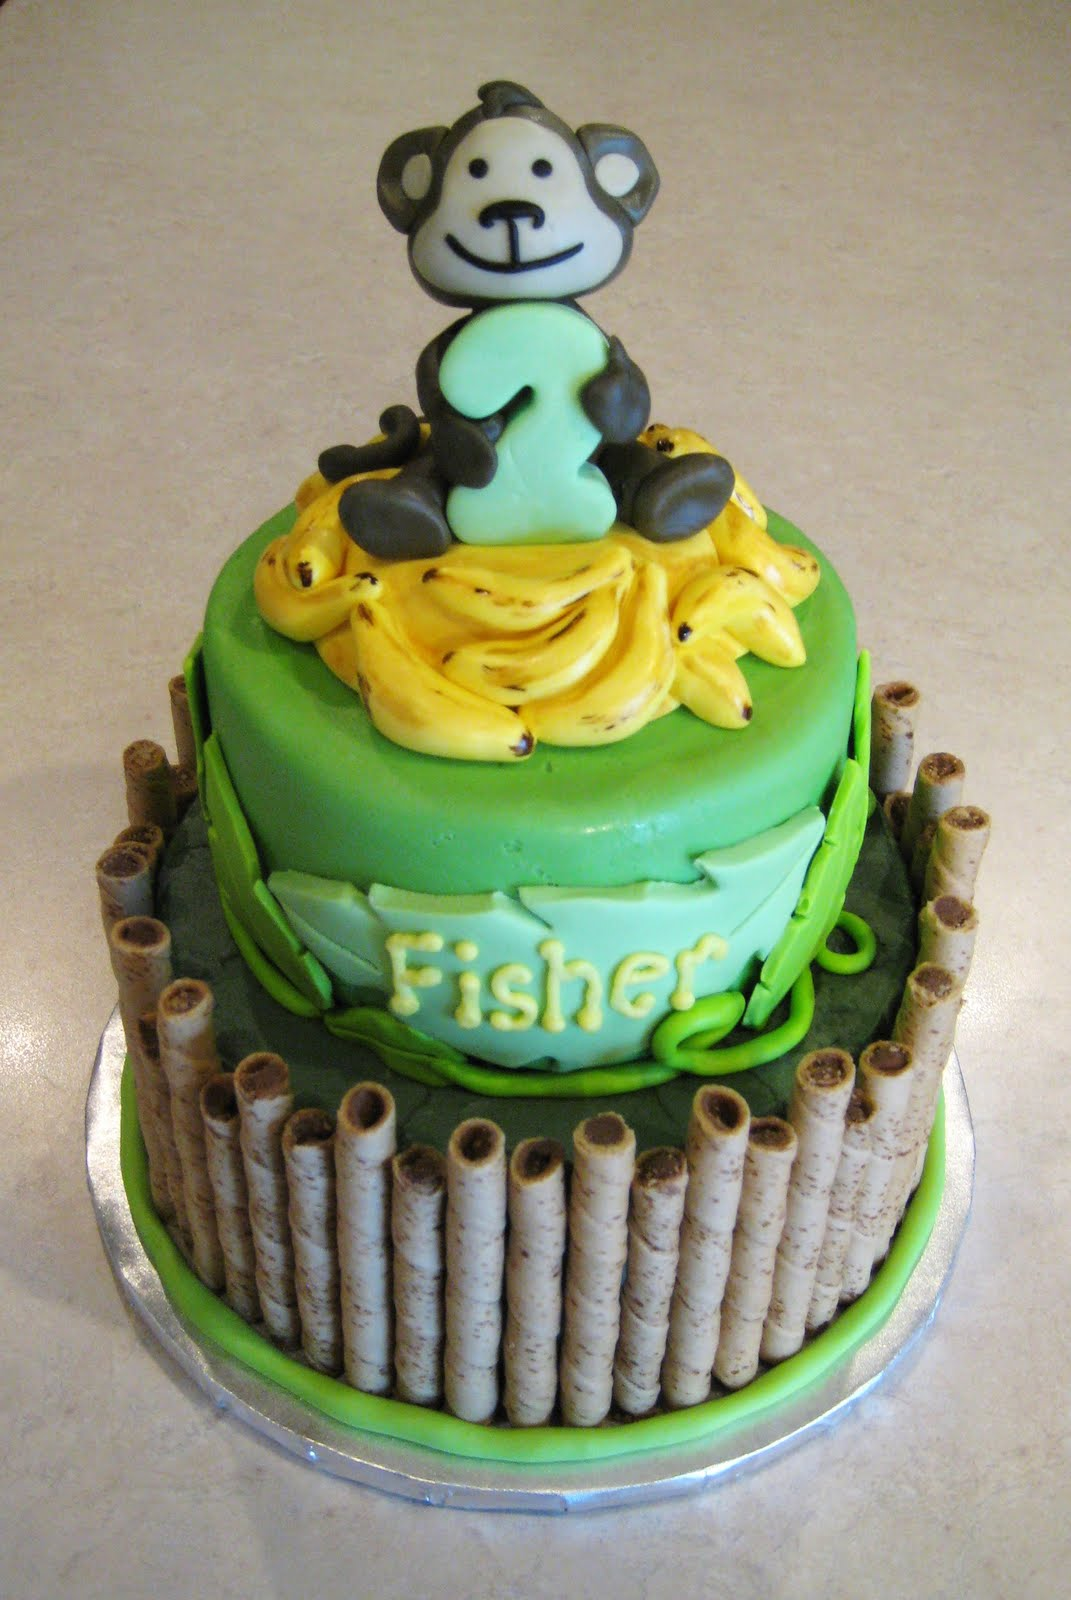 Custom Cakes By Julie: Monkey Cake